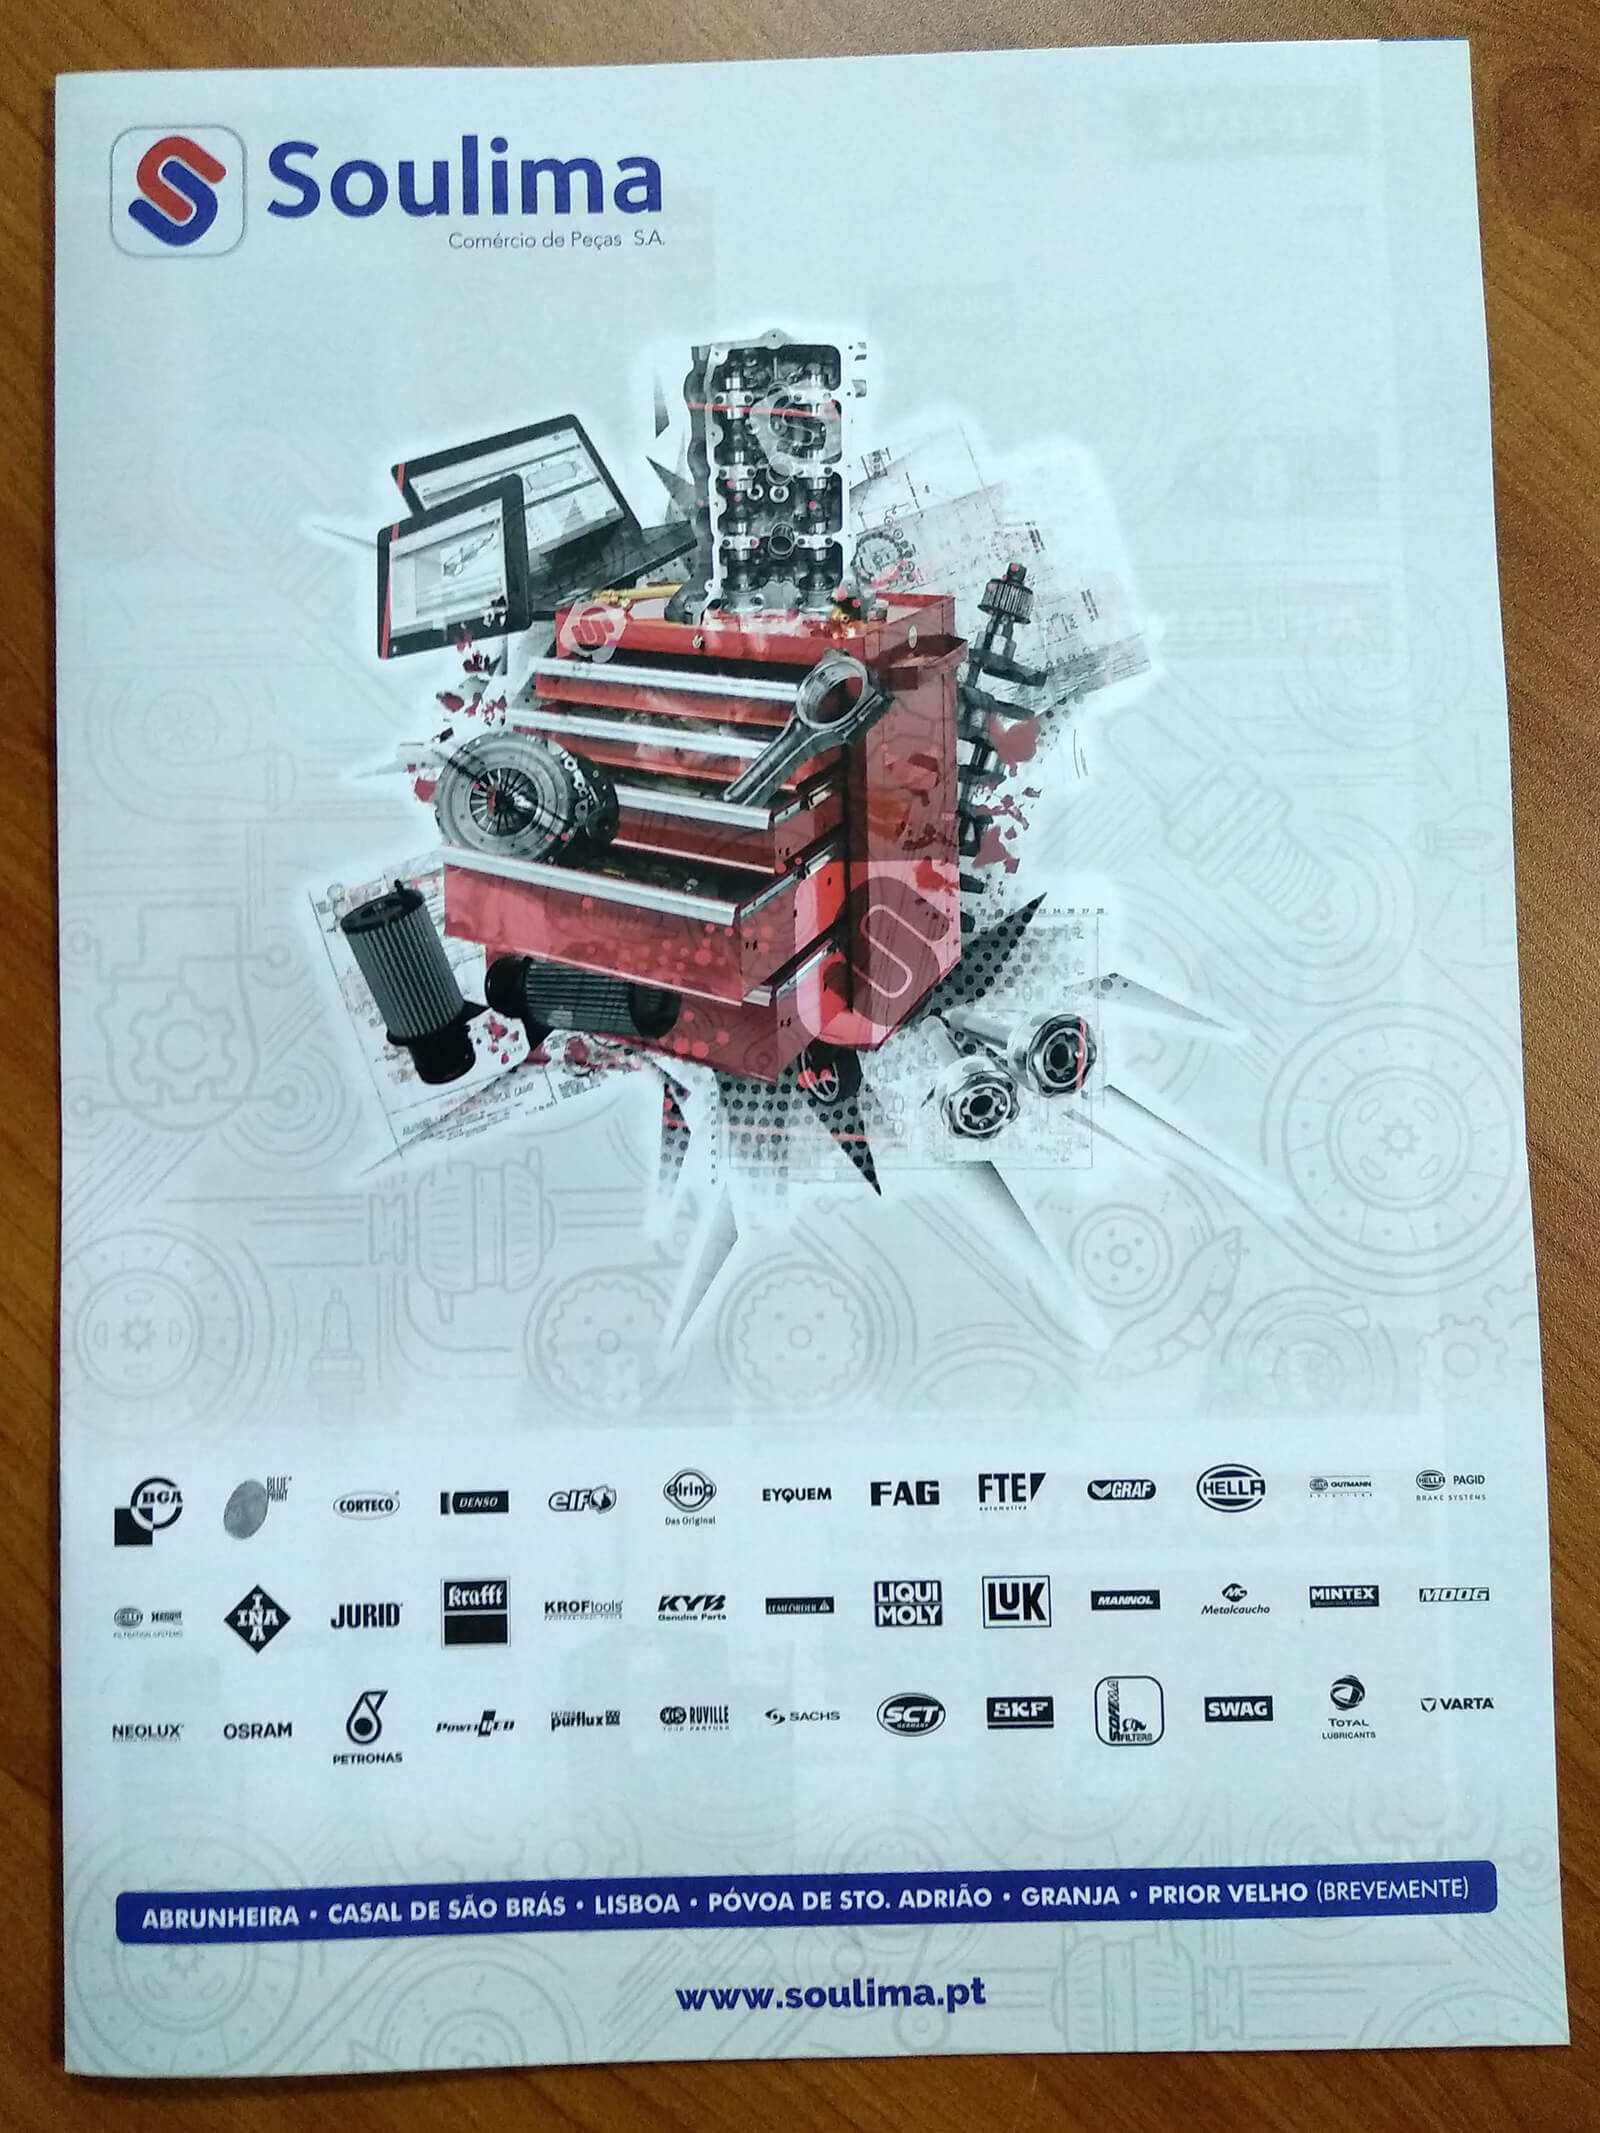 Soulima - Comércio de Peças - Printed Brochure Soulima - Cover | Luis Serra Freelancer